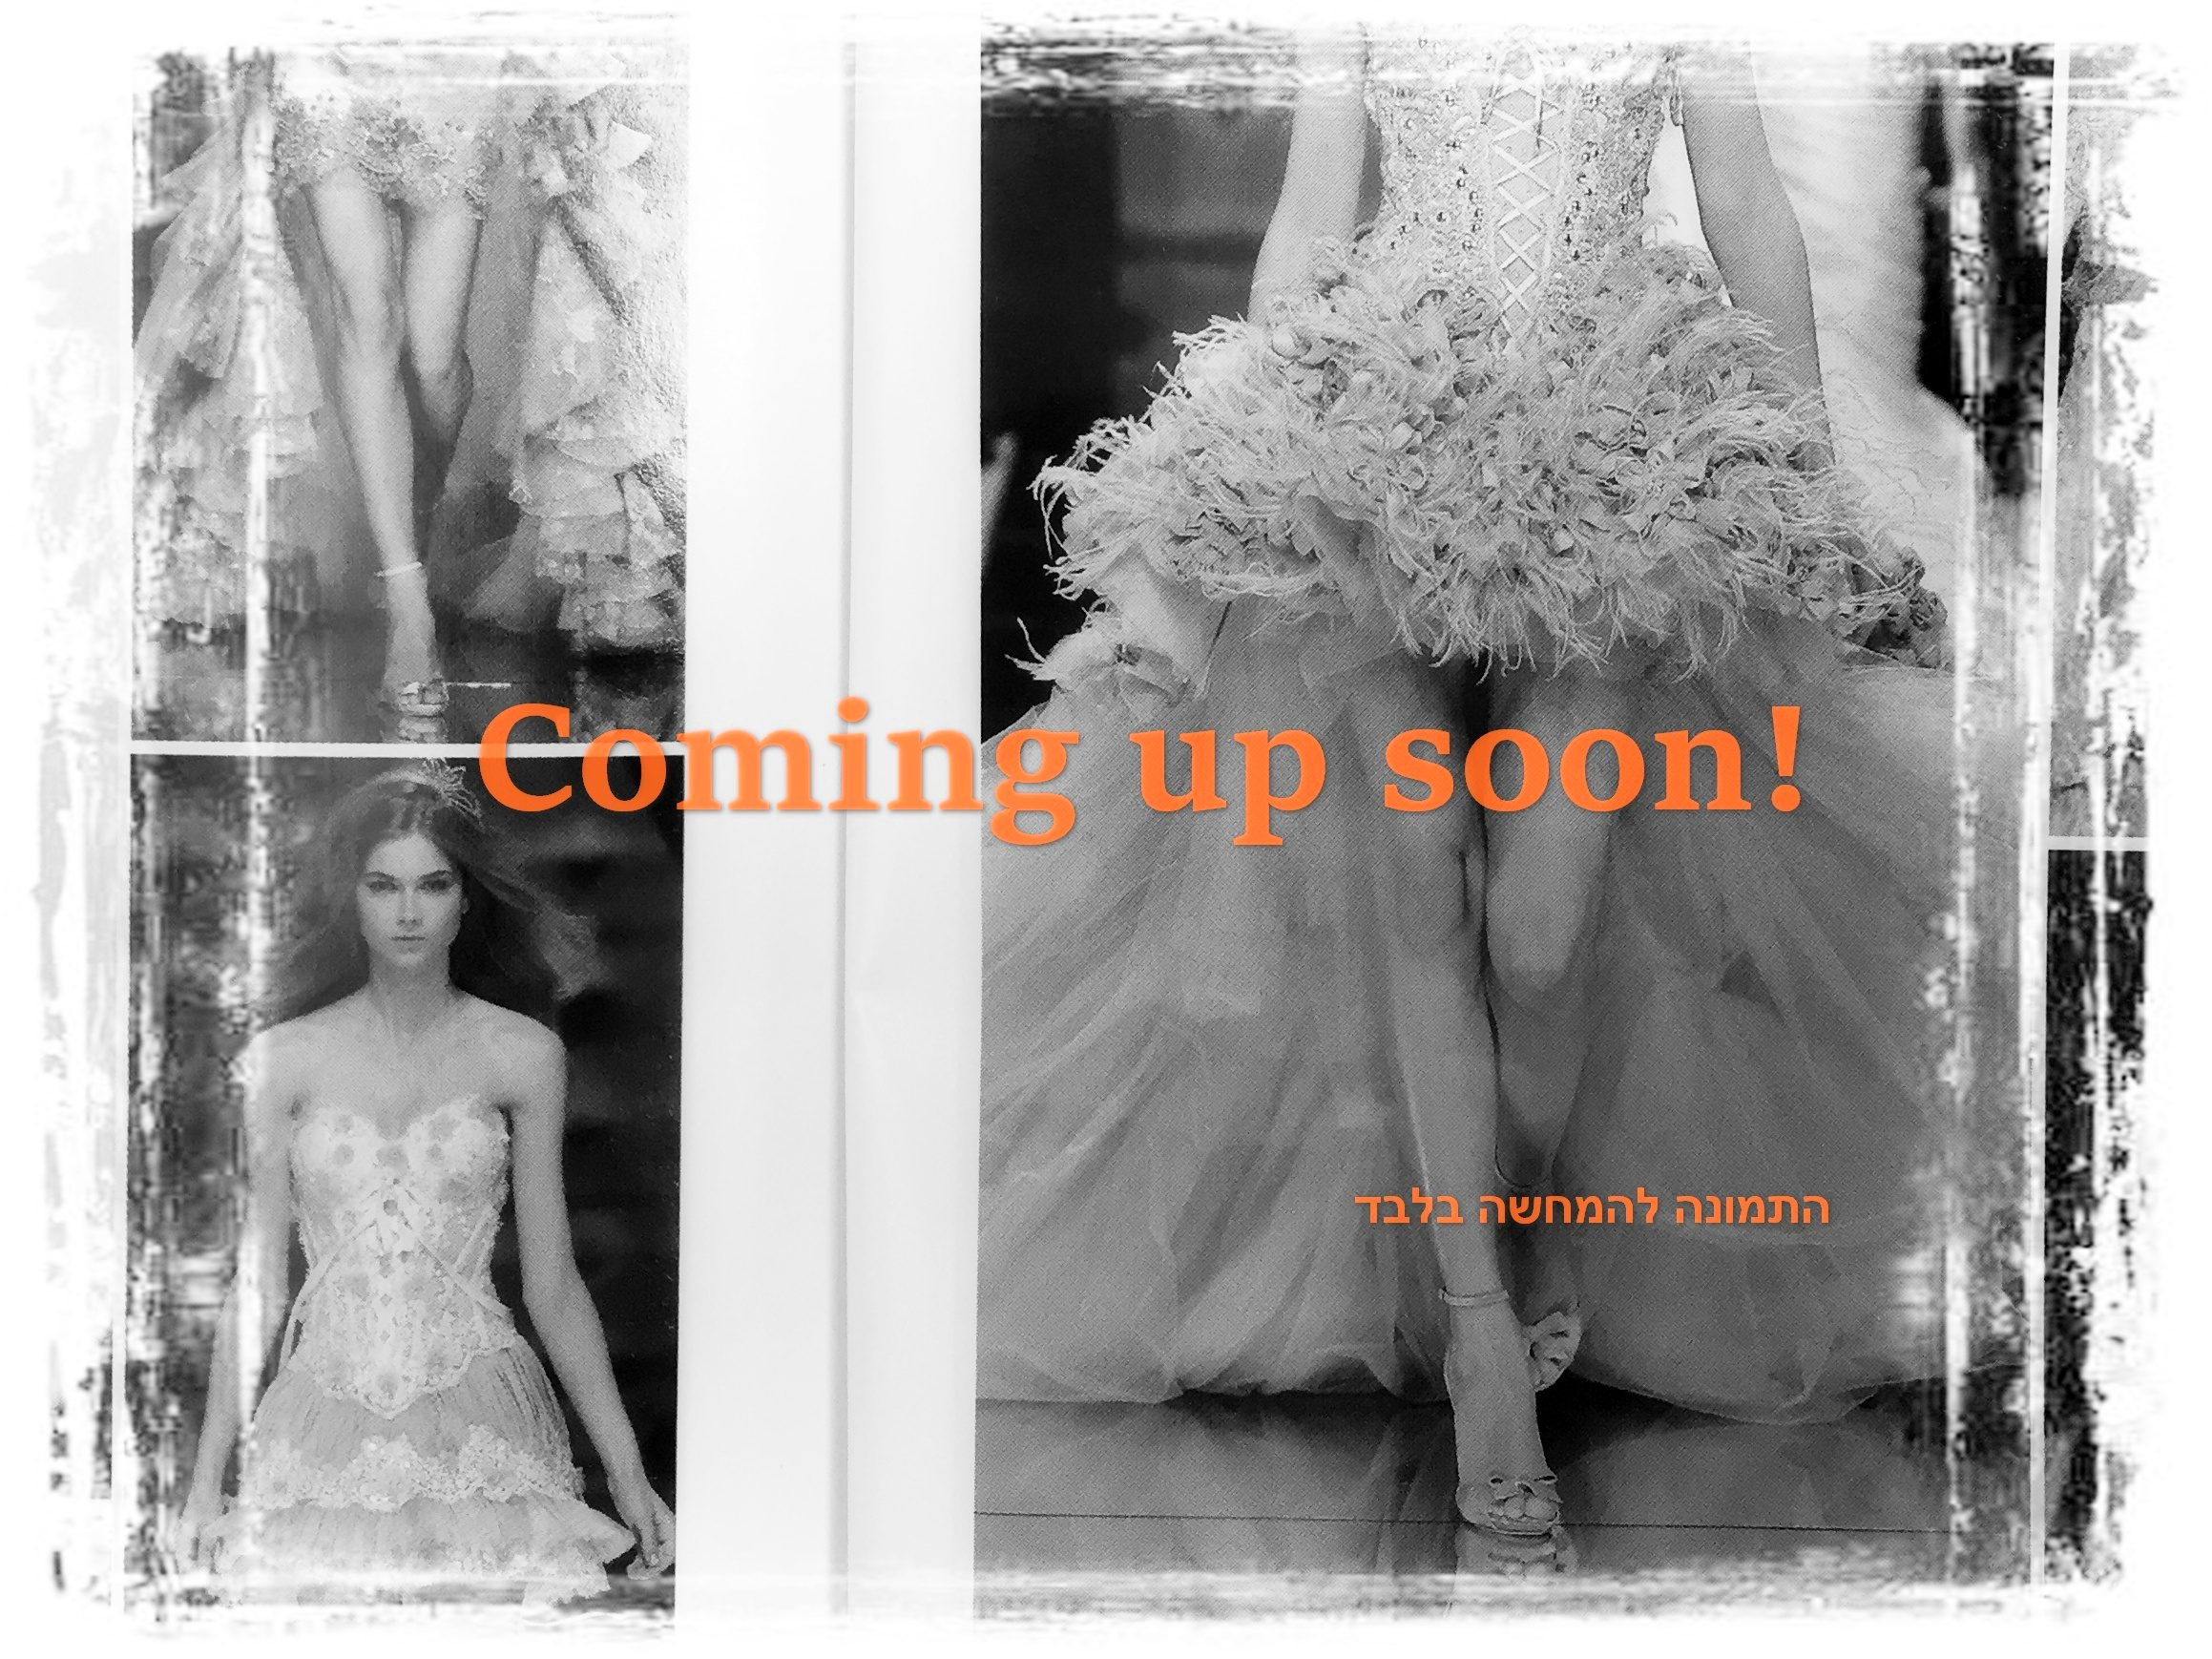 Wedding mini dress Collection 2020